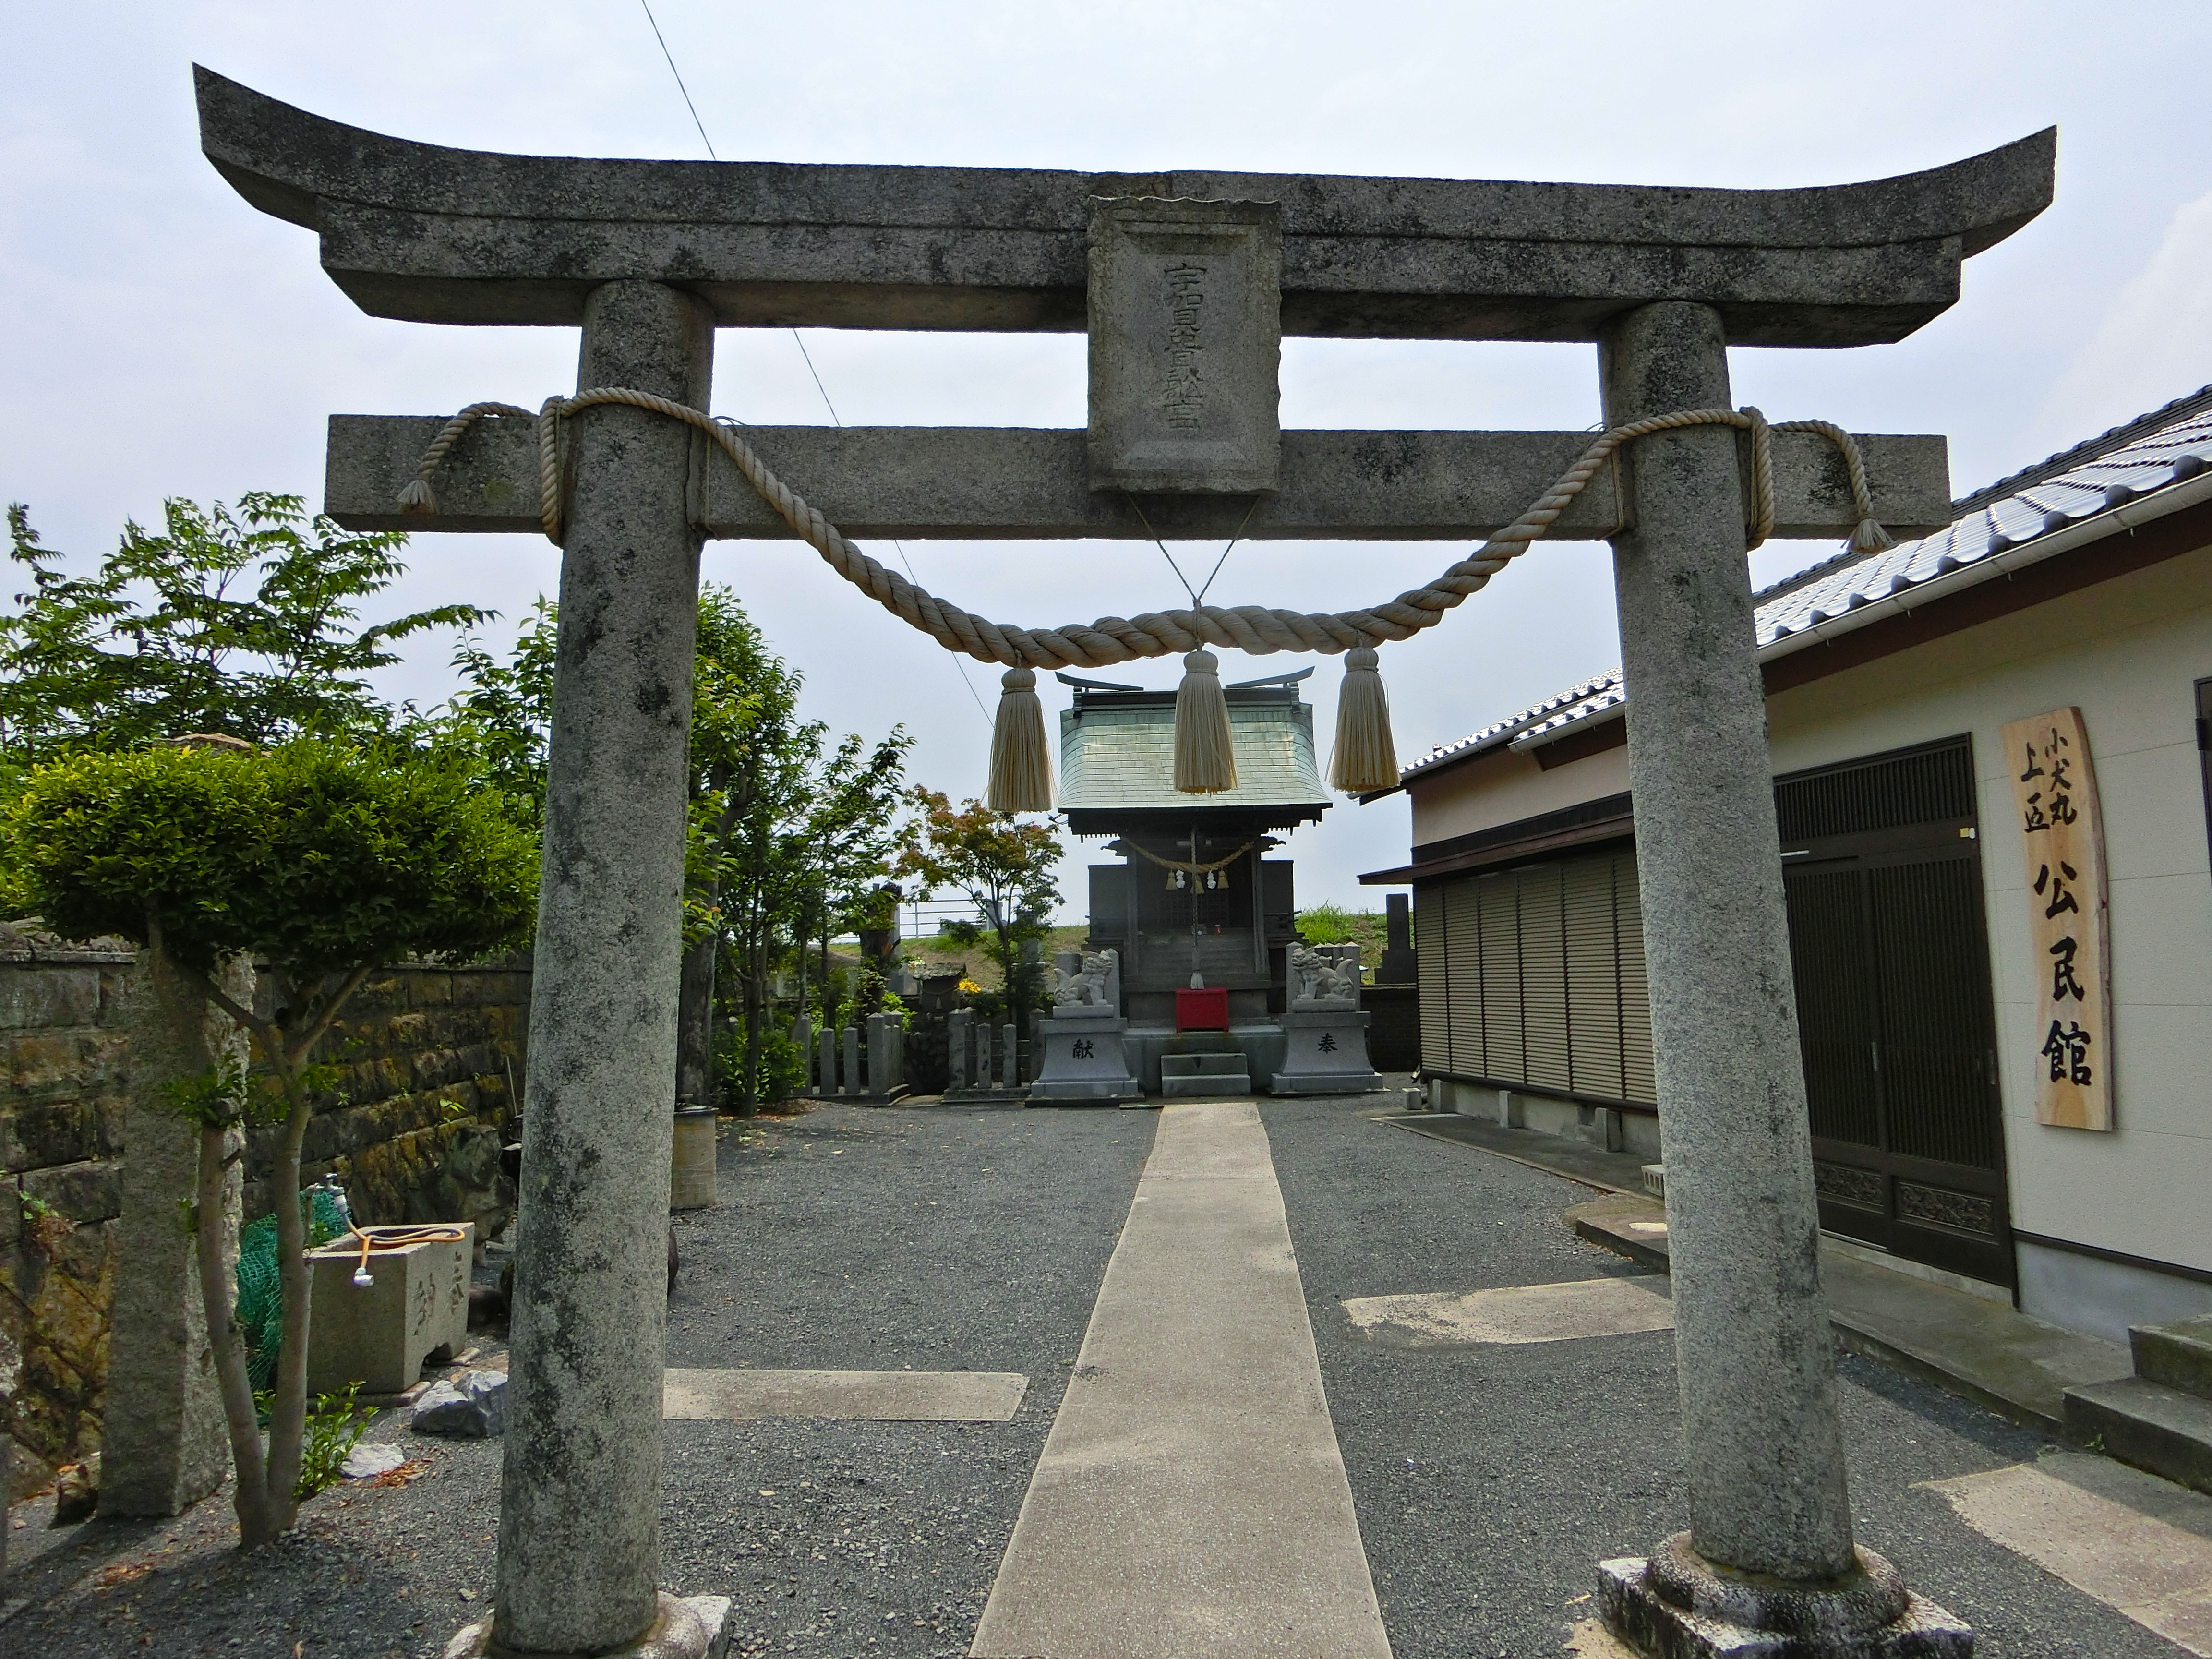 宇賀貴船神社(福岡県吉富町) | 旅人のブログ